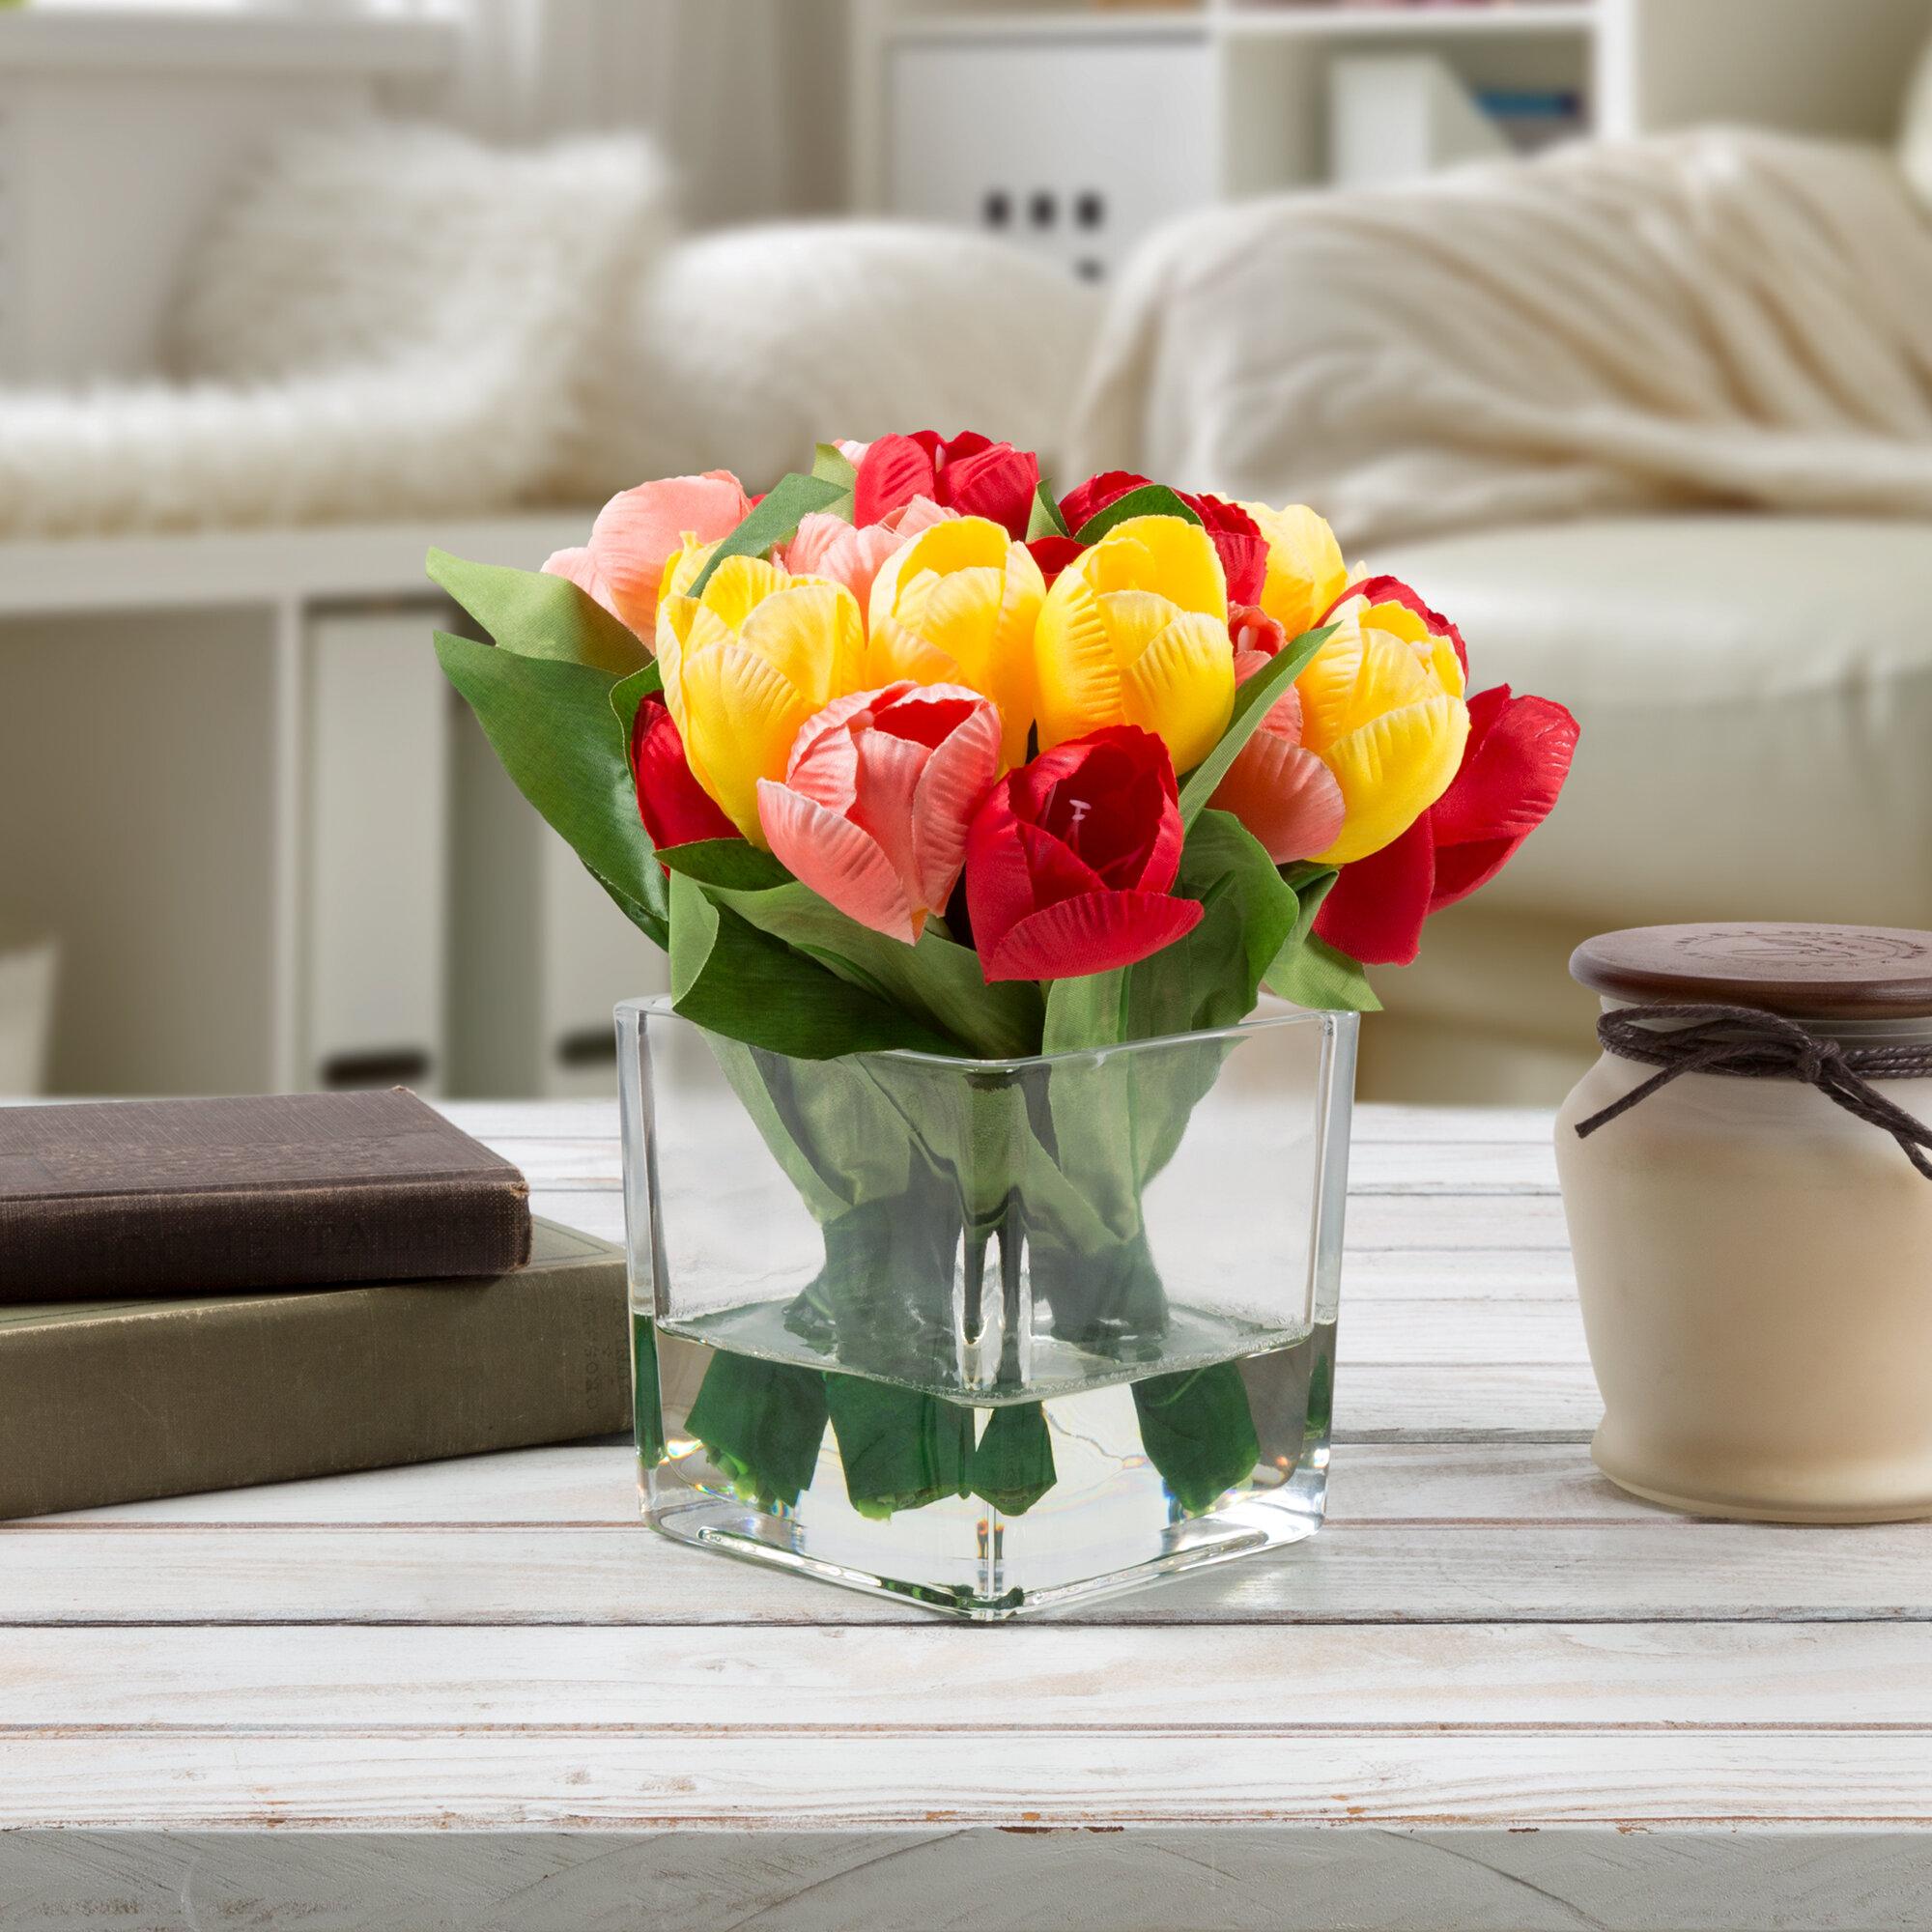 Tulip floral arrangement in glass vase reviews joss main reviewsmspy